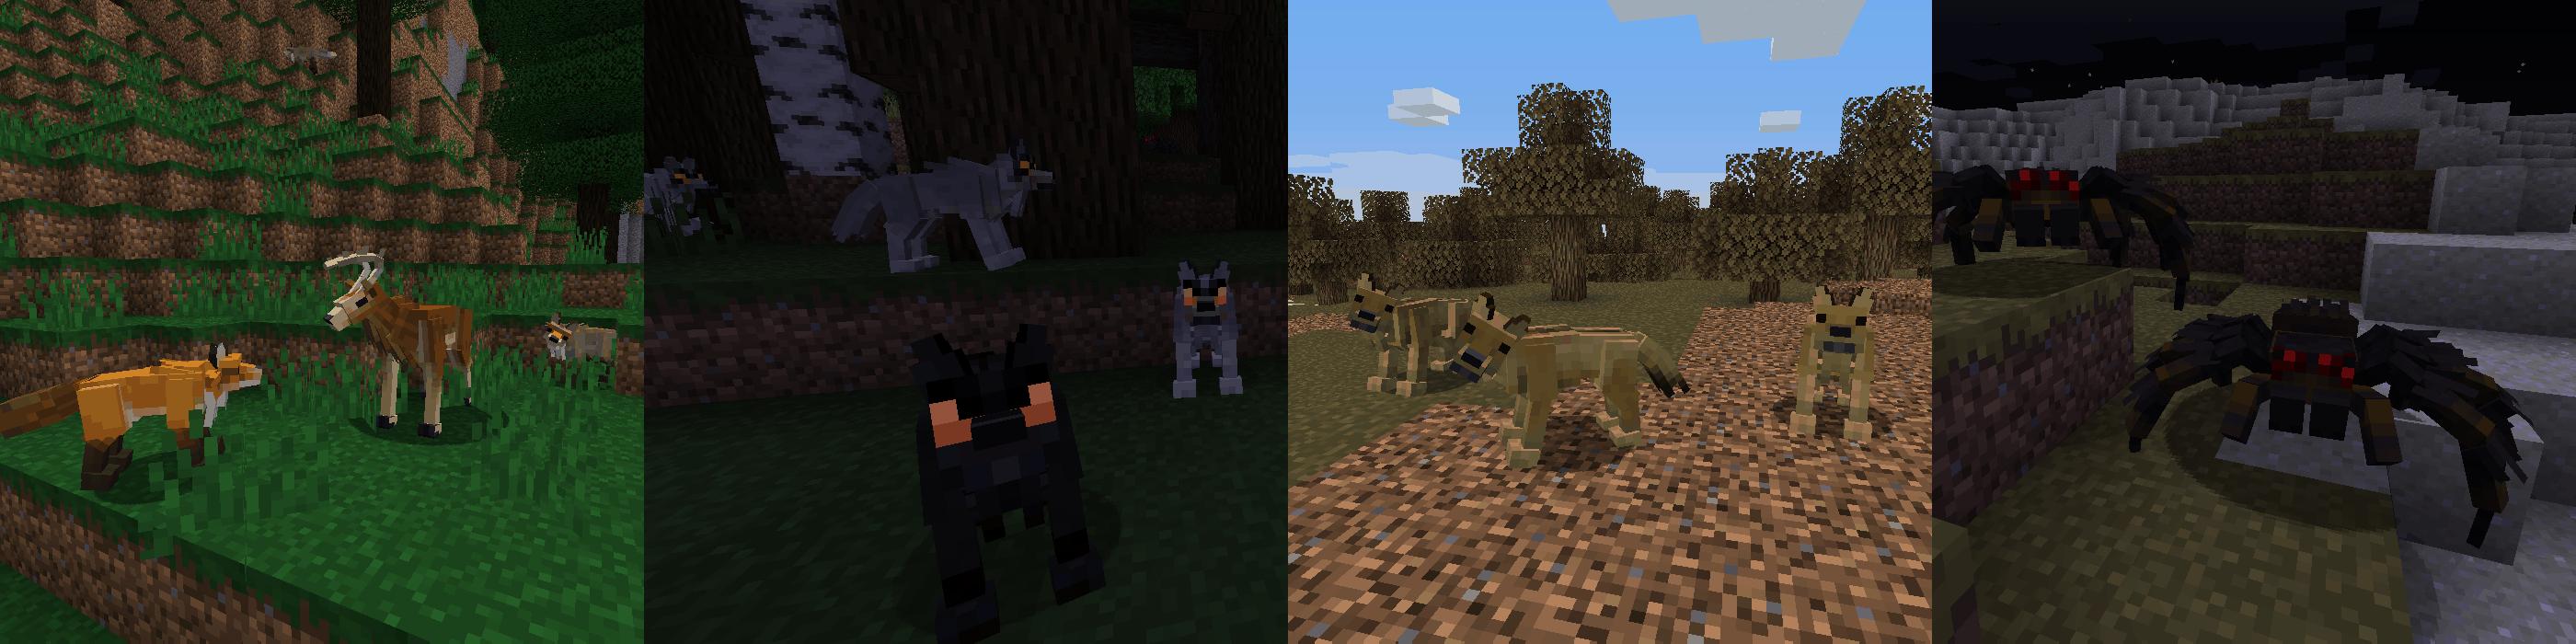 Mod] Better Animals Plus [1 12 2 - 1 14 4] - Minecraft-France